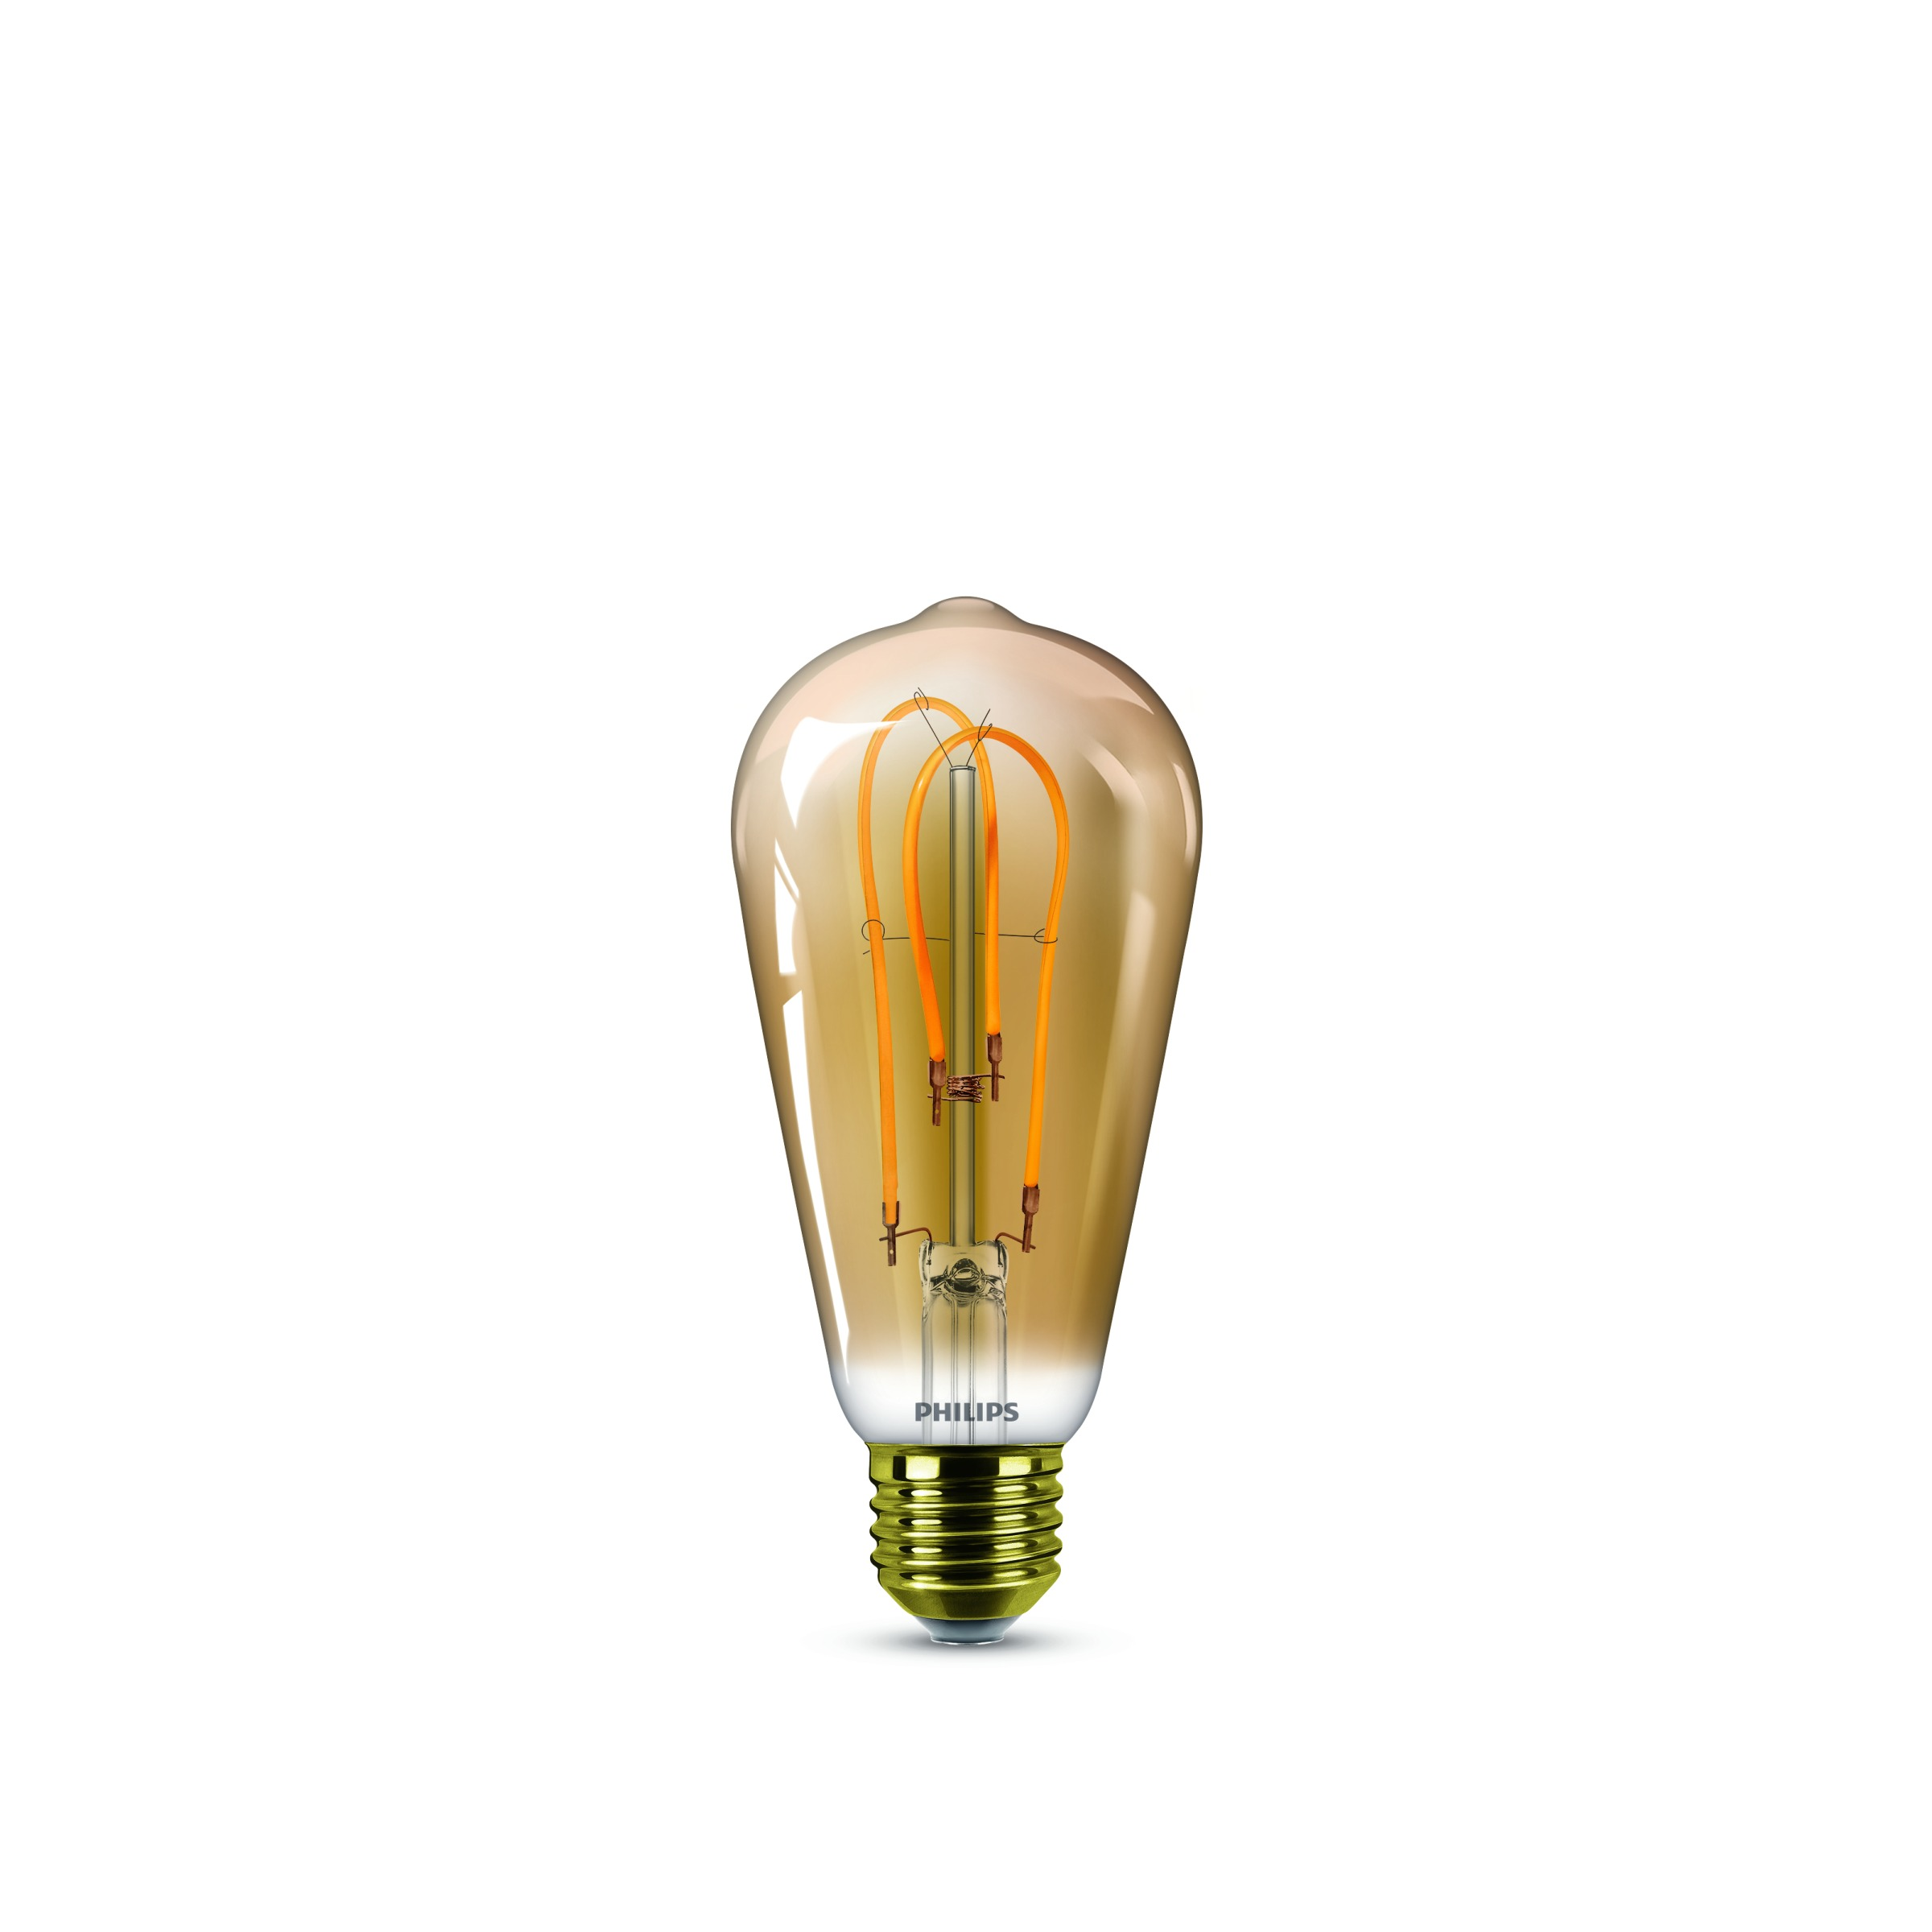 LED-lamp E27 Peer 5 W = 25 W Goud Energielabel: A Philips Lighting 1 stuks